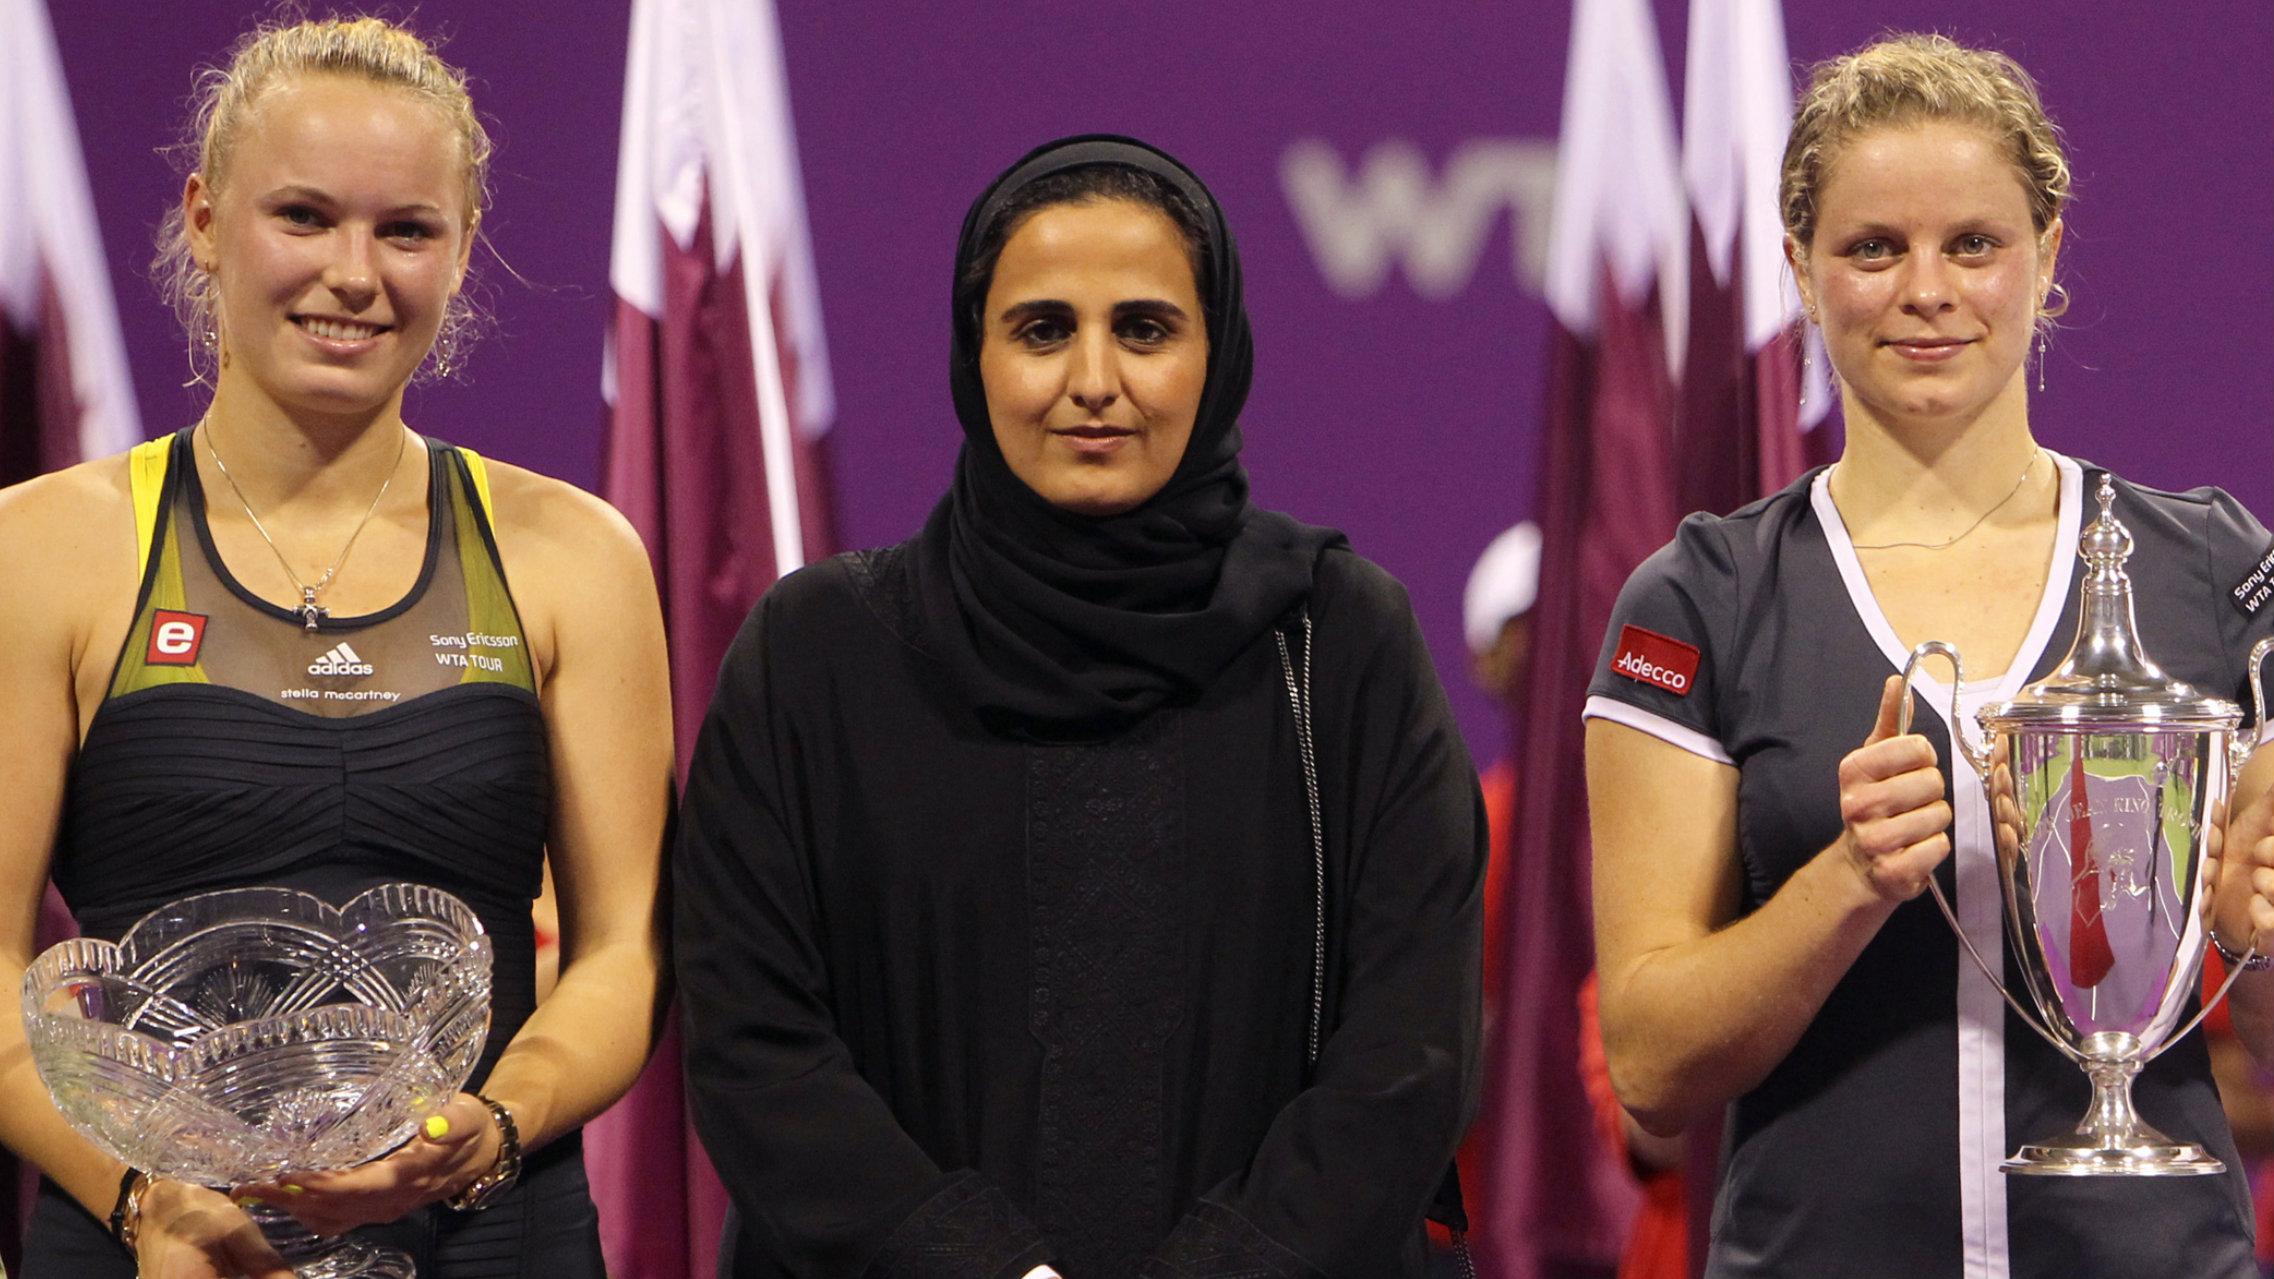 Qatar sheikha mayassa tops art power list art